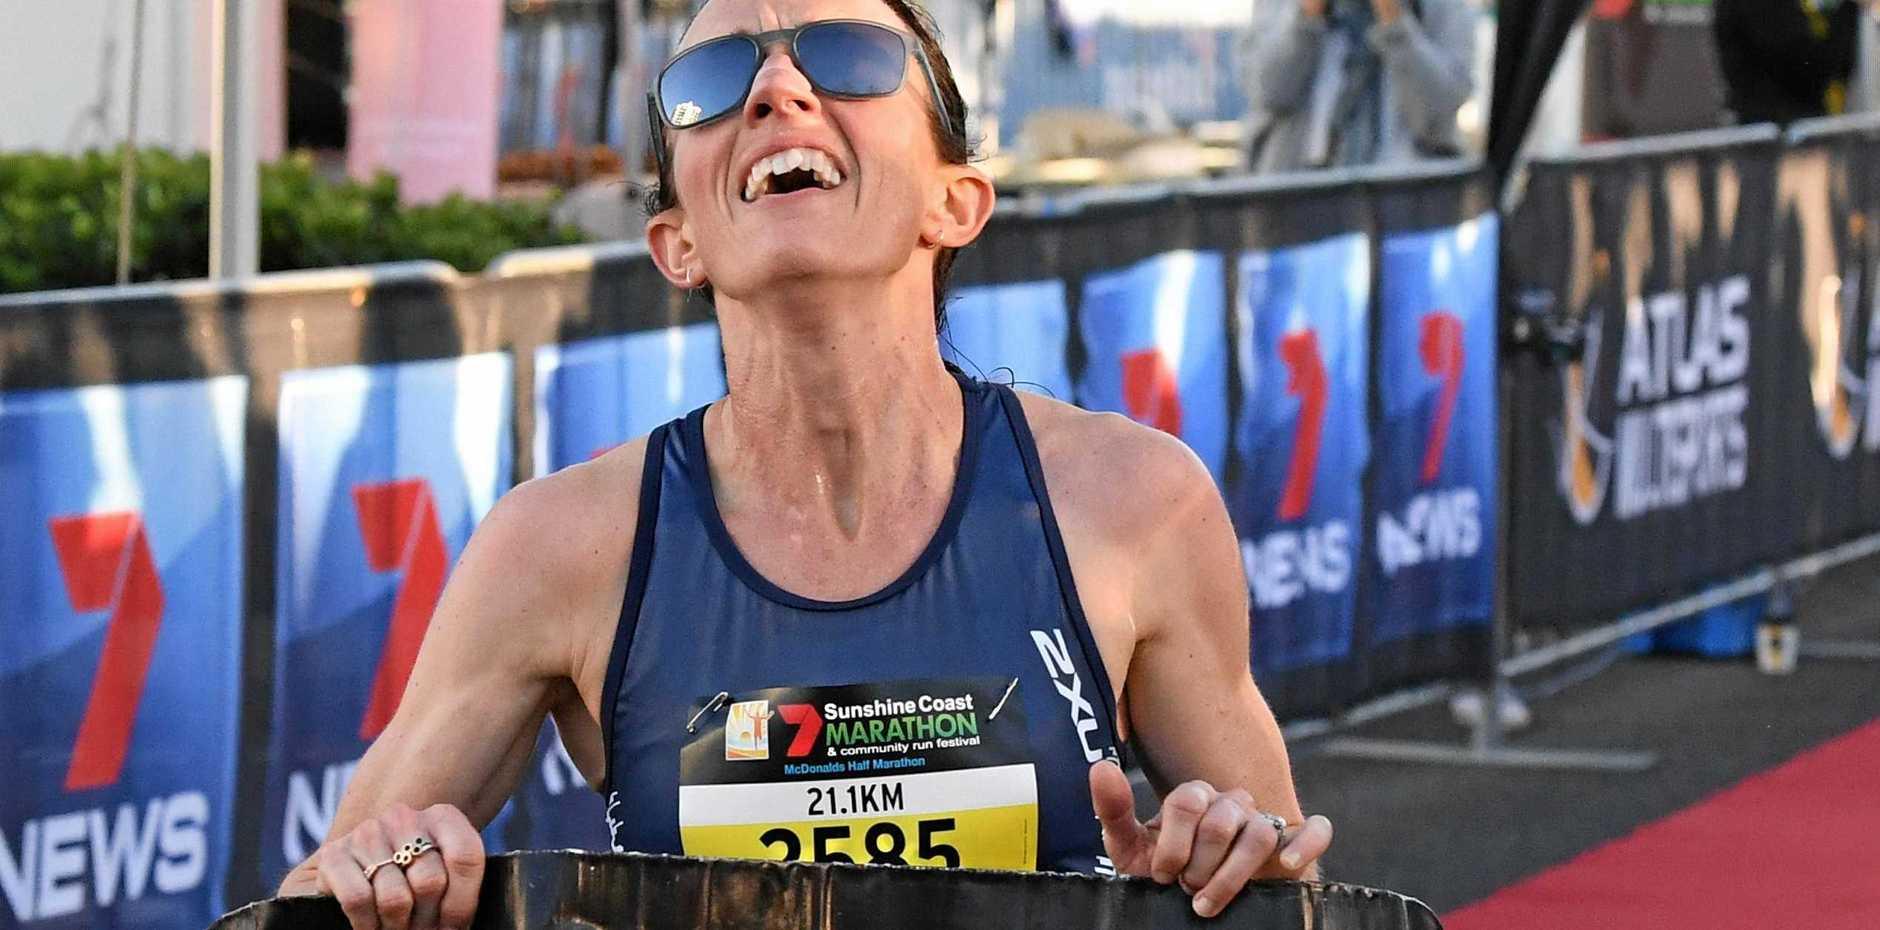 7 Sunshine Coast Marathon and Community Run FestivalLisa Weightman wins the women's half marathon.